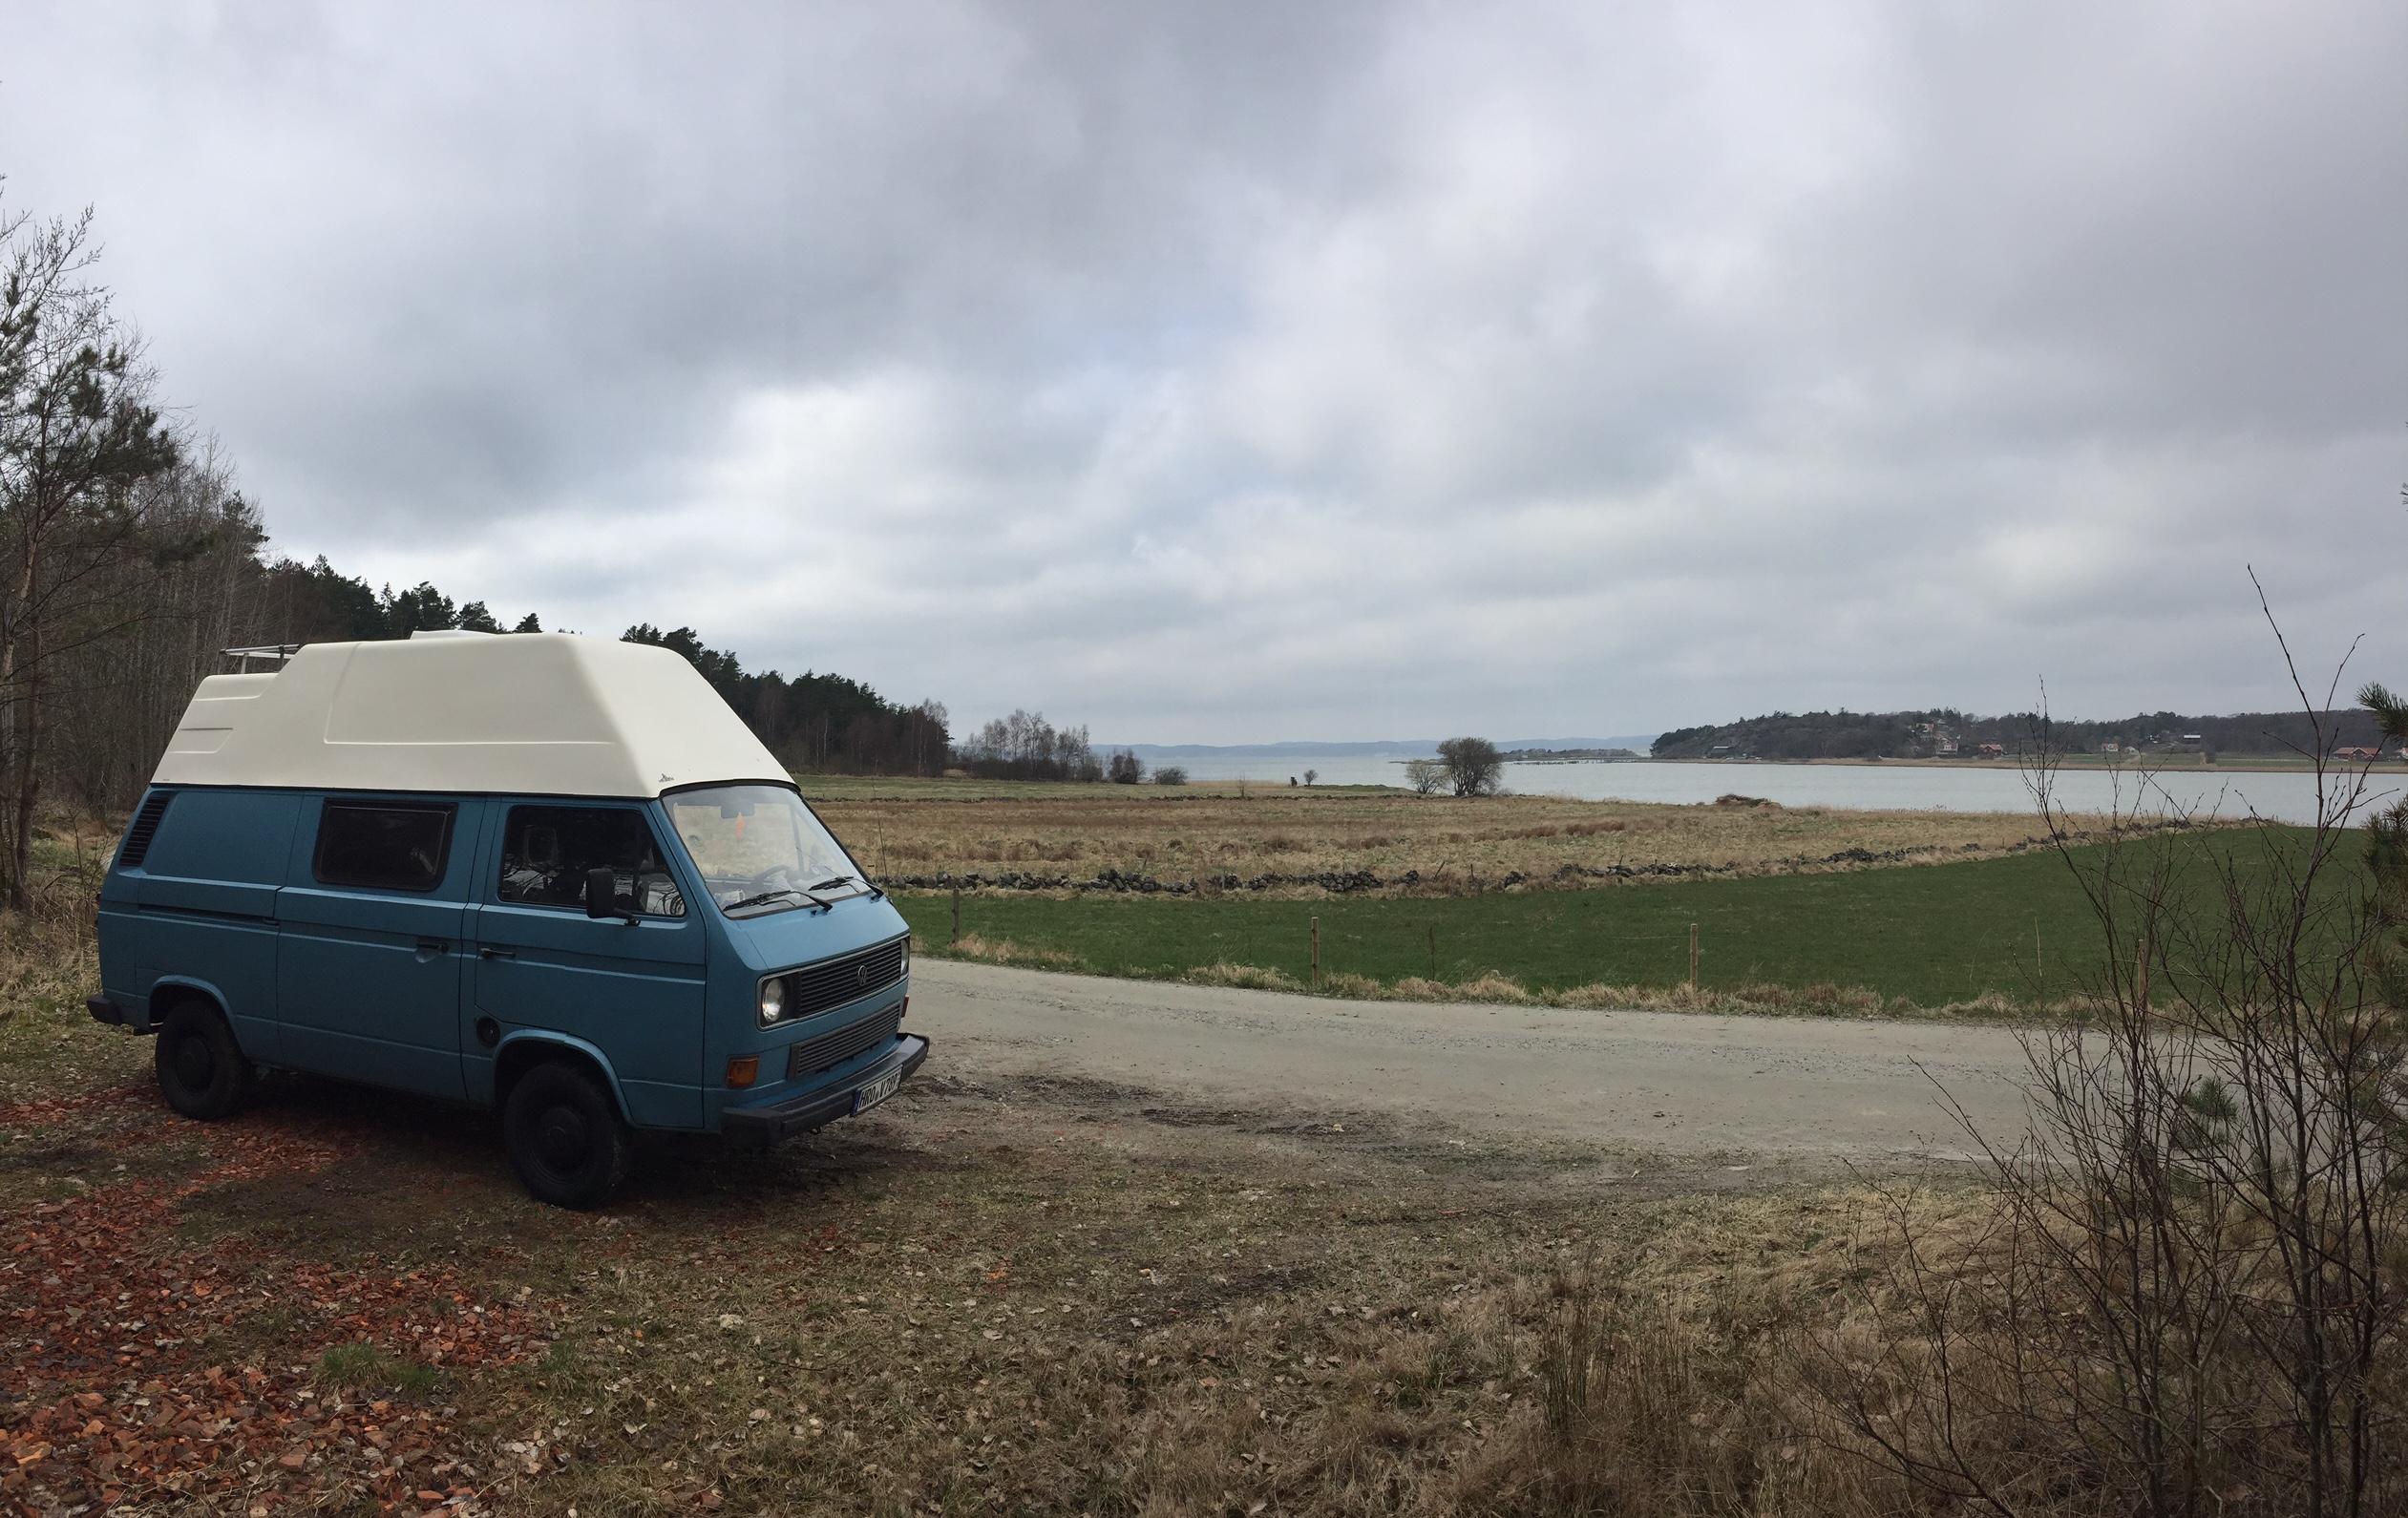 VW-T3-camper-mieten-rostock-urlaub-ostsee-schweden-norwegen-betti1